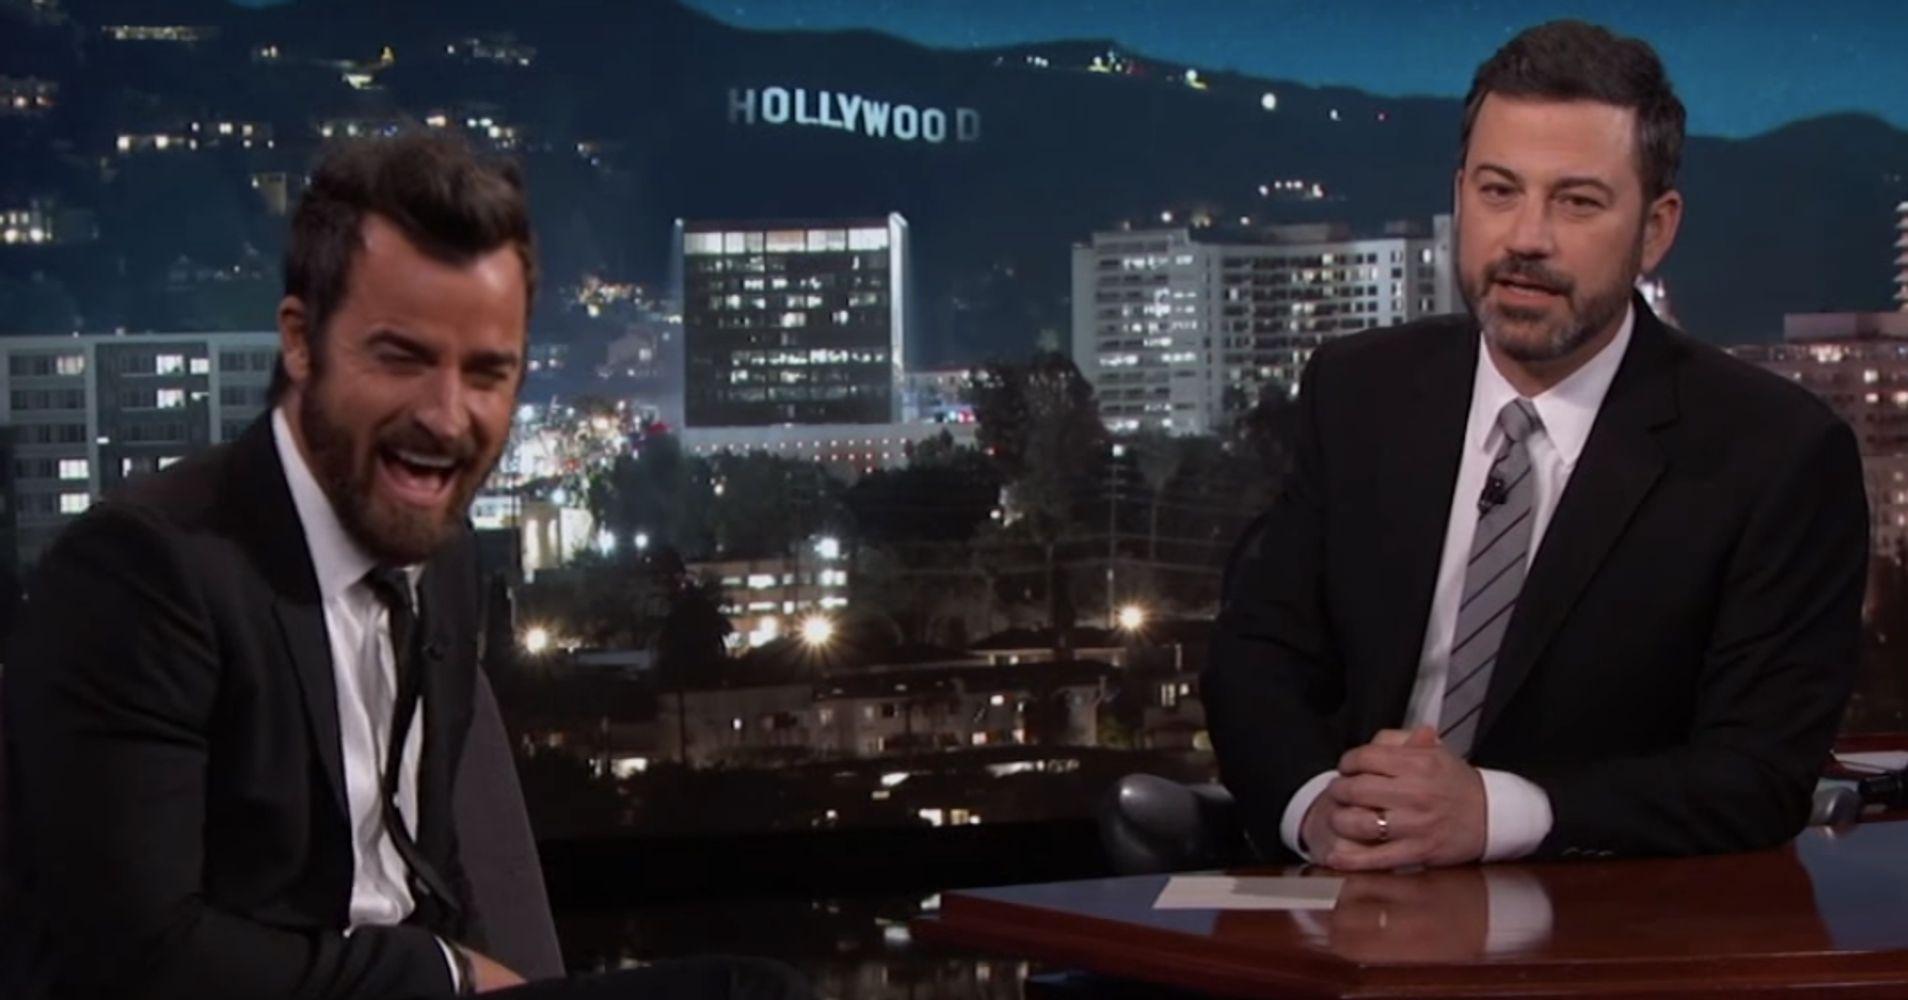 Jimmy Kimmel And Jennifer Aniston Team Up To Prank Justin Theroux ...